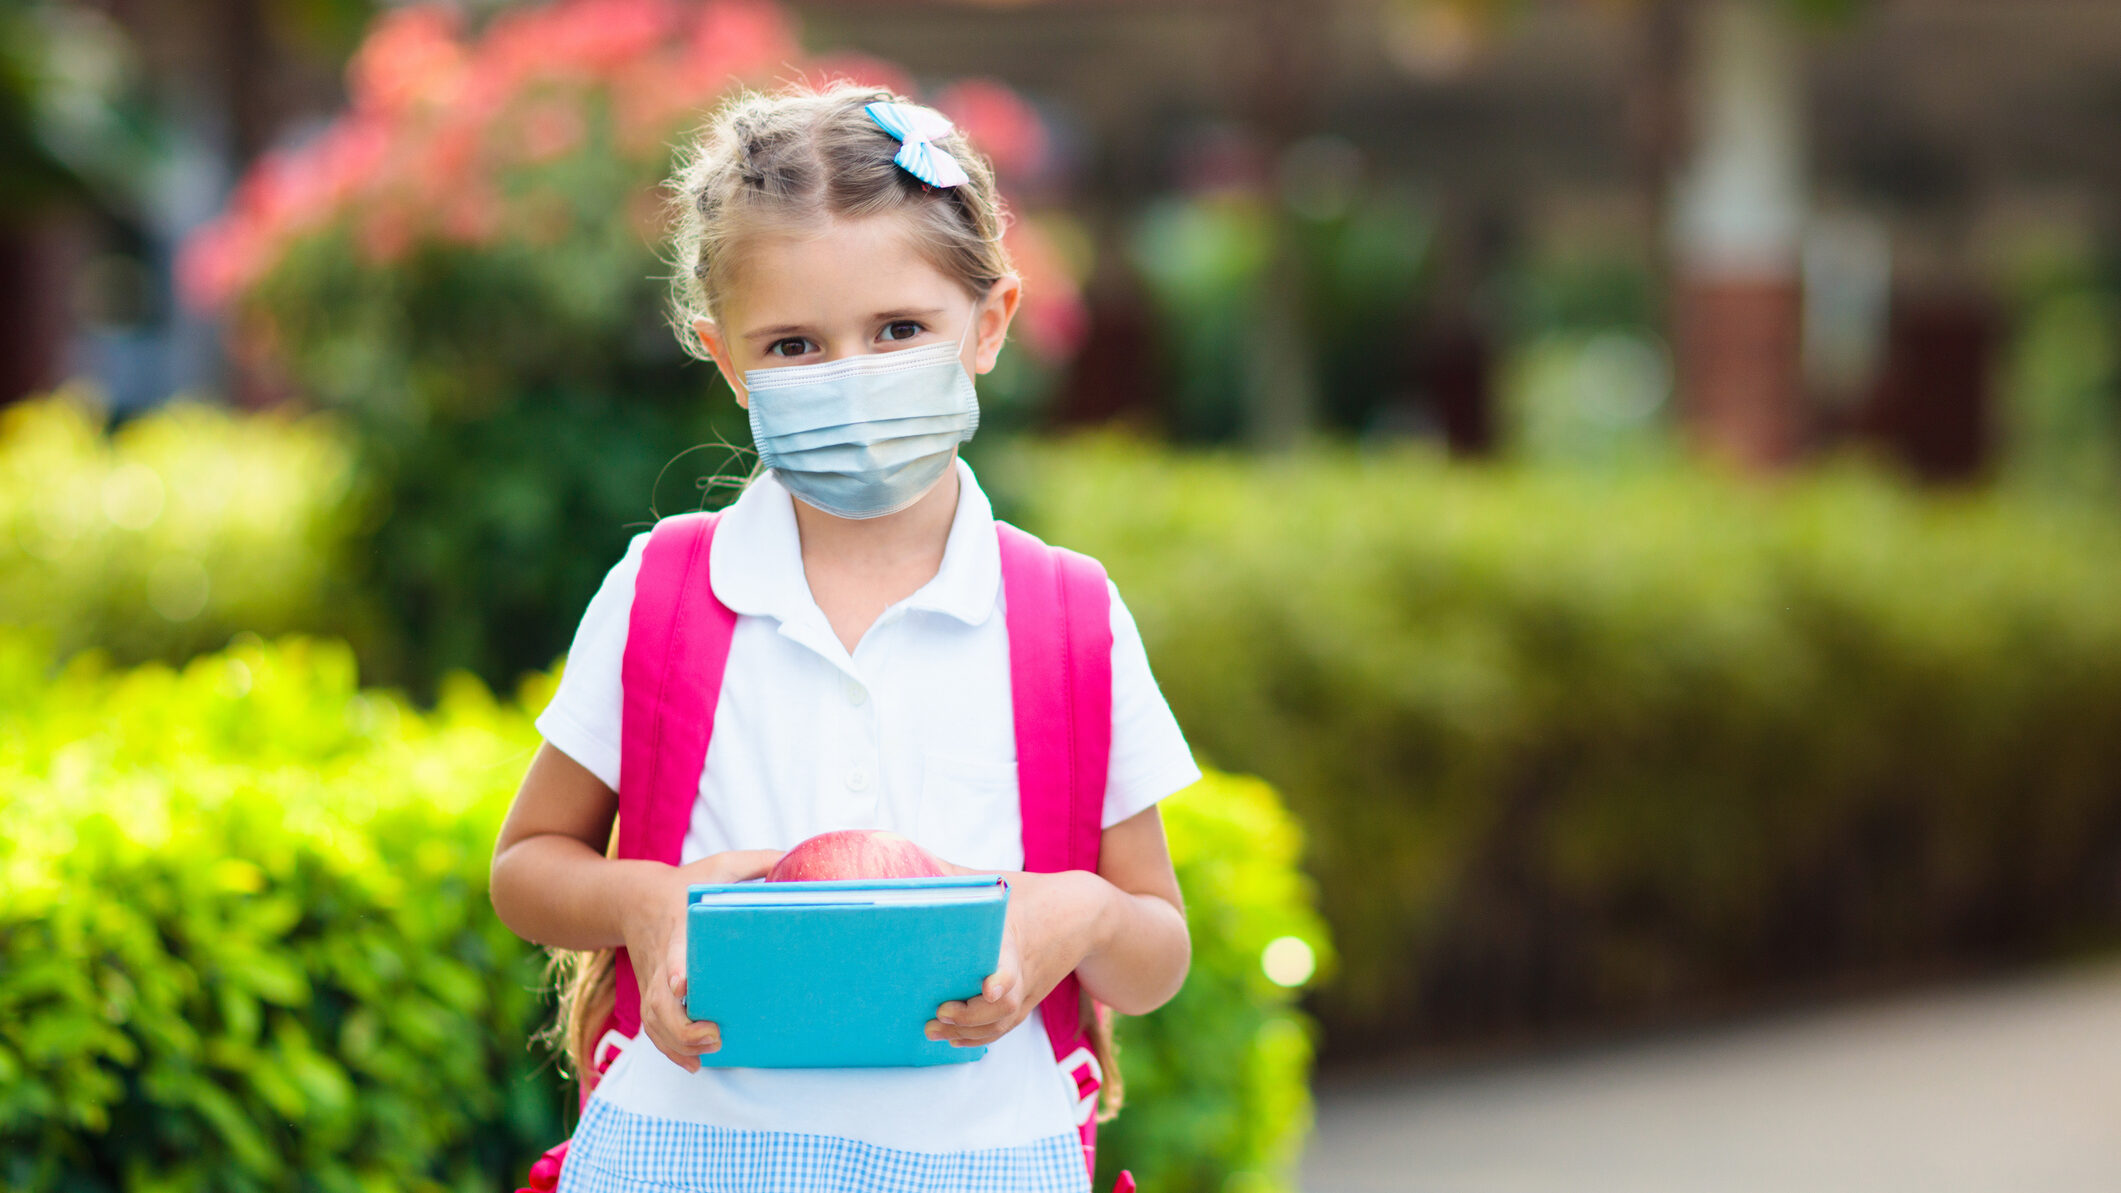 Child wearing face mask. Virus outbreak.